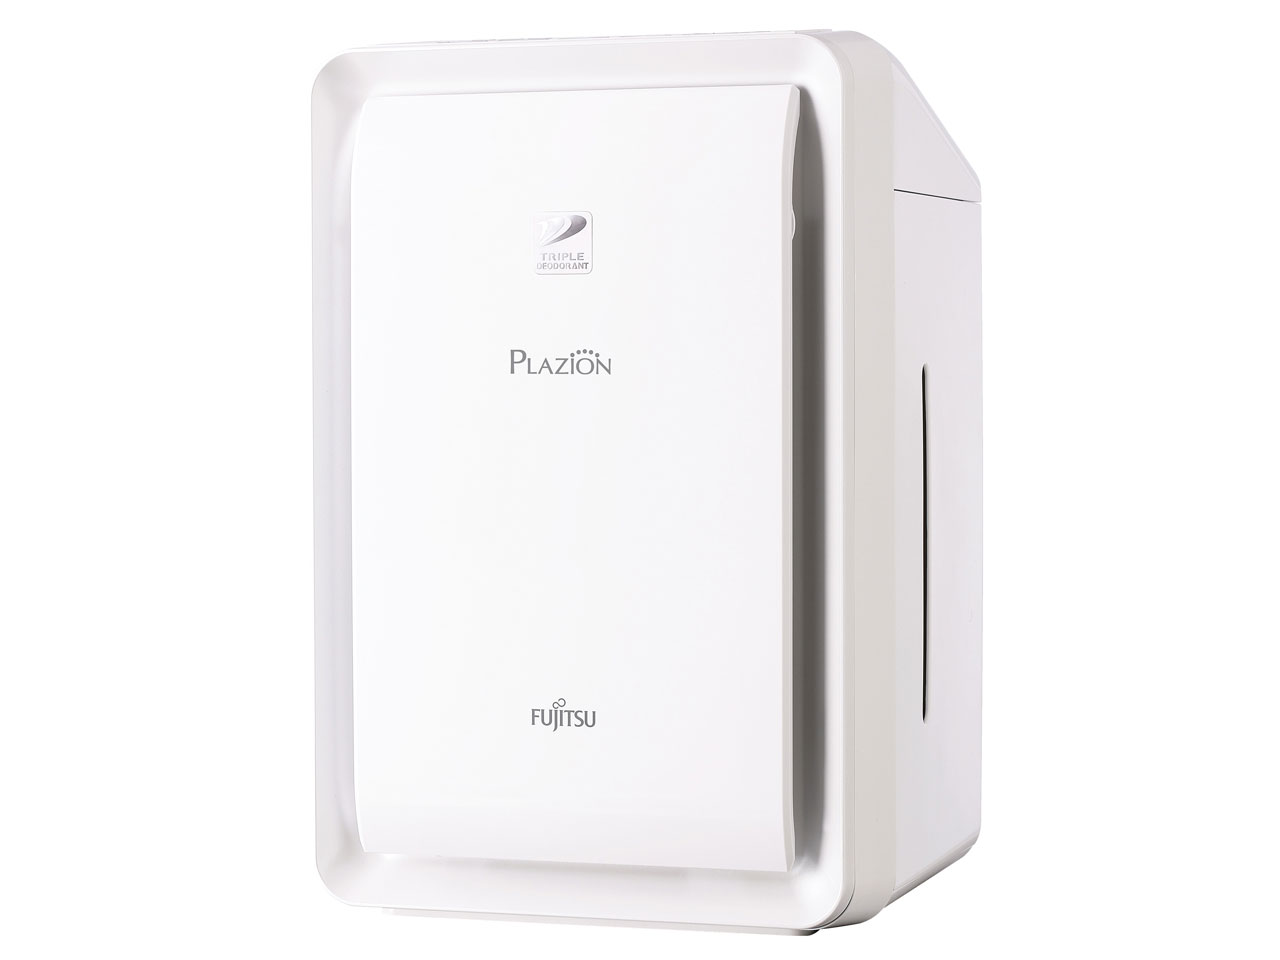 PLAZION DAS-303K-W [ホワイト] の製品画像